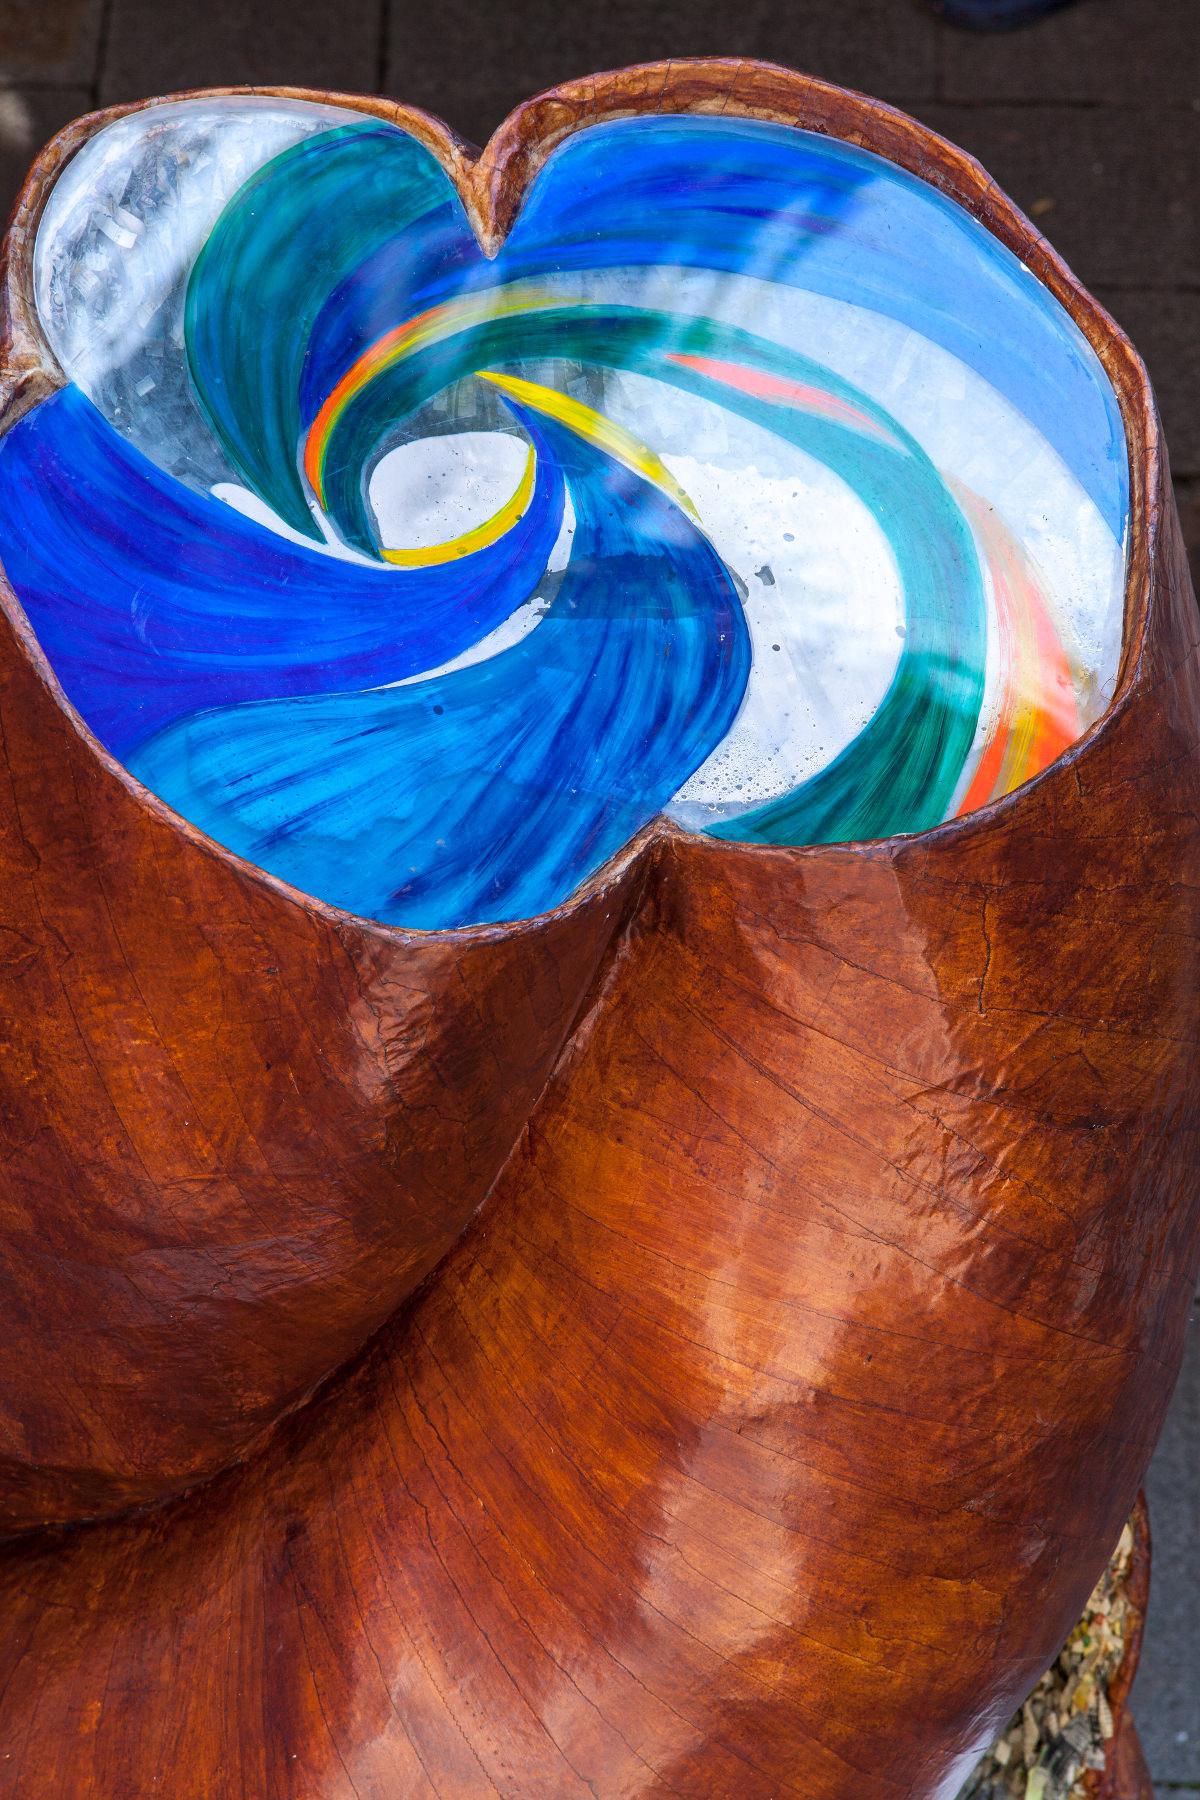 Mariyo Yagi - Nawa Shrine 2015 - The traveling isolation of Maimai - Spiral Nail